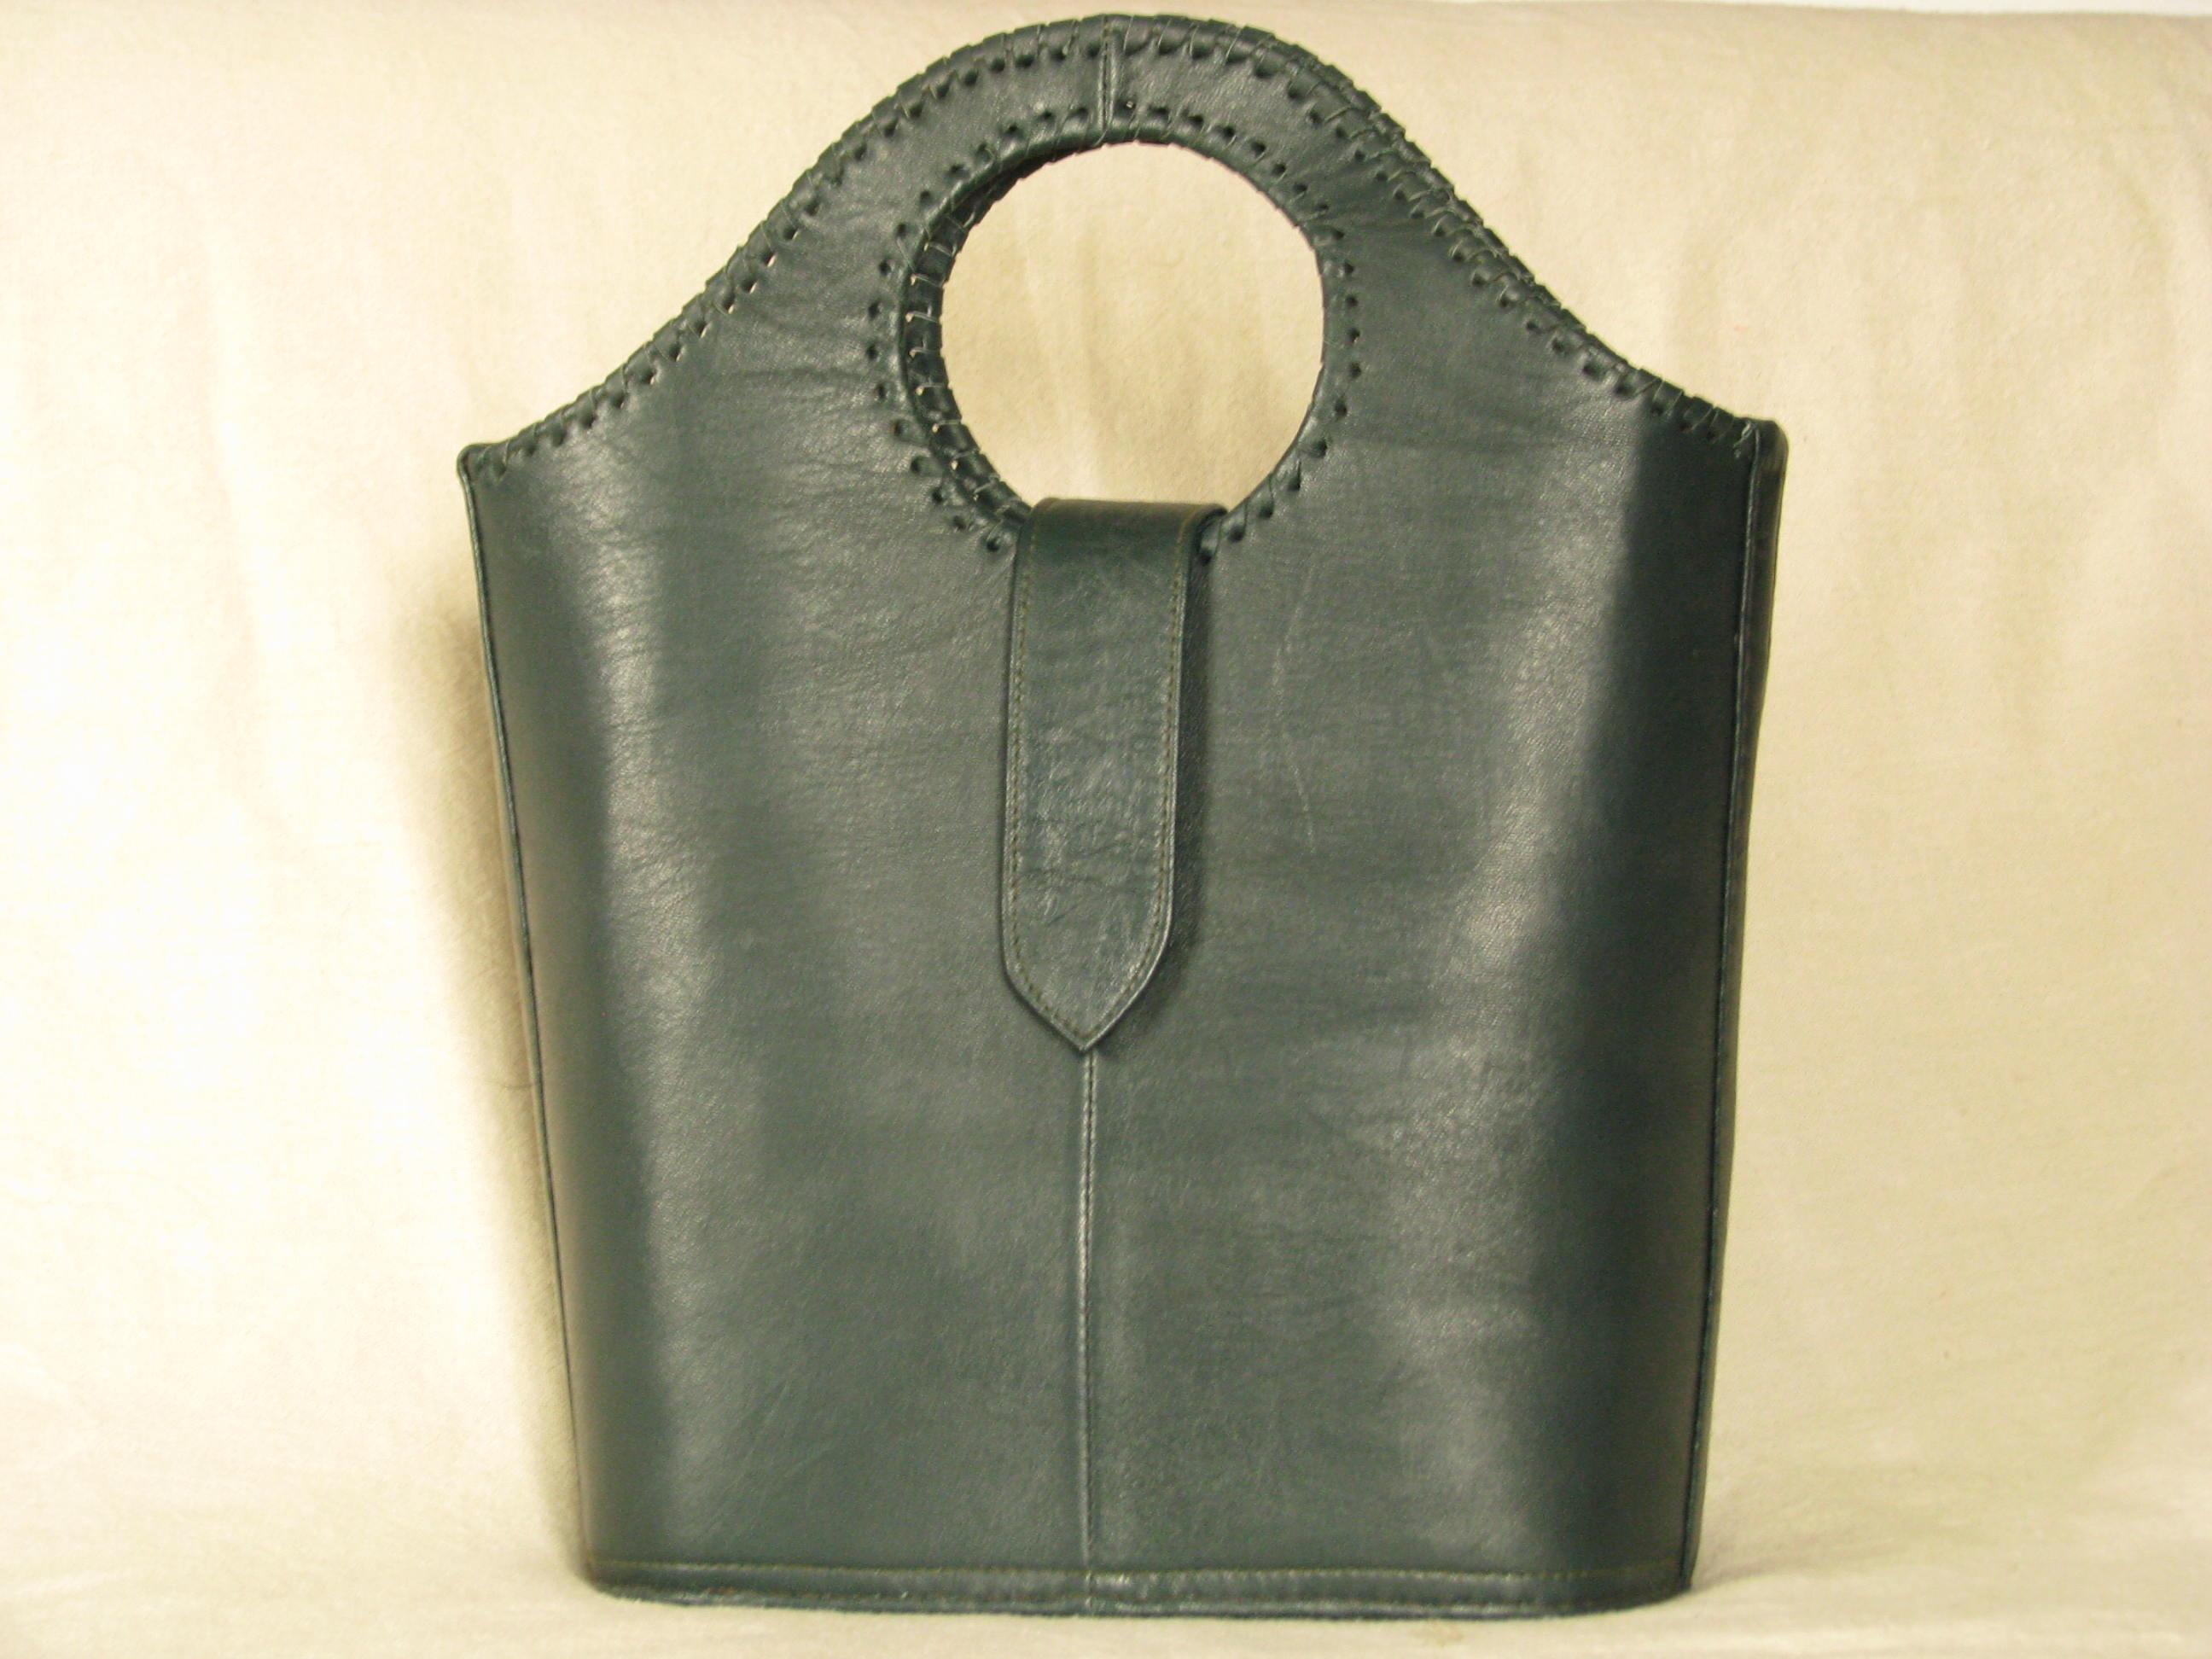 Gundara - Real Leather Shopper - dark-green - genuine leather - from Afghanistan - fair trade